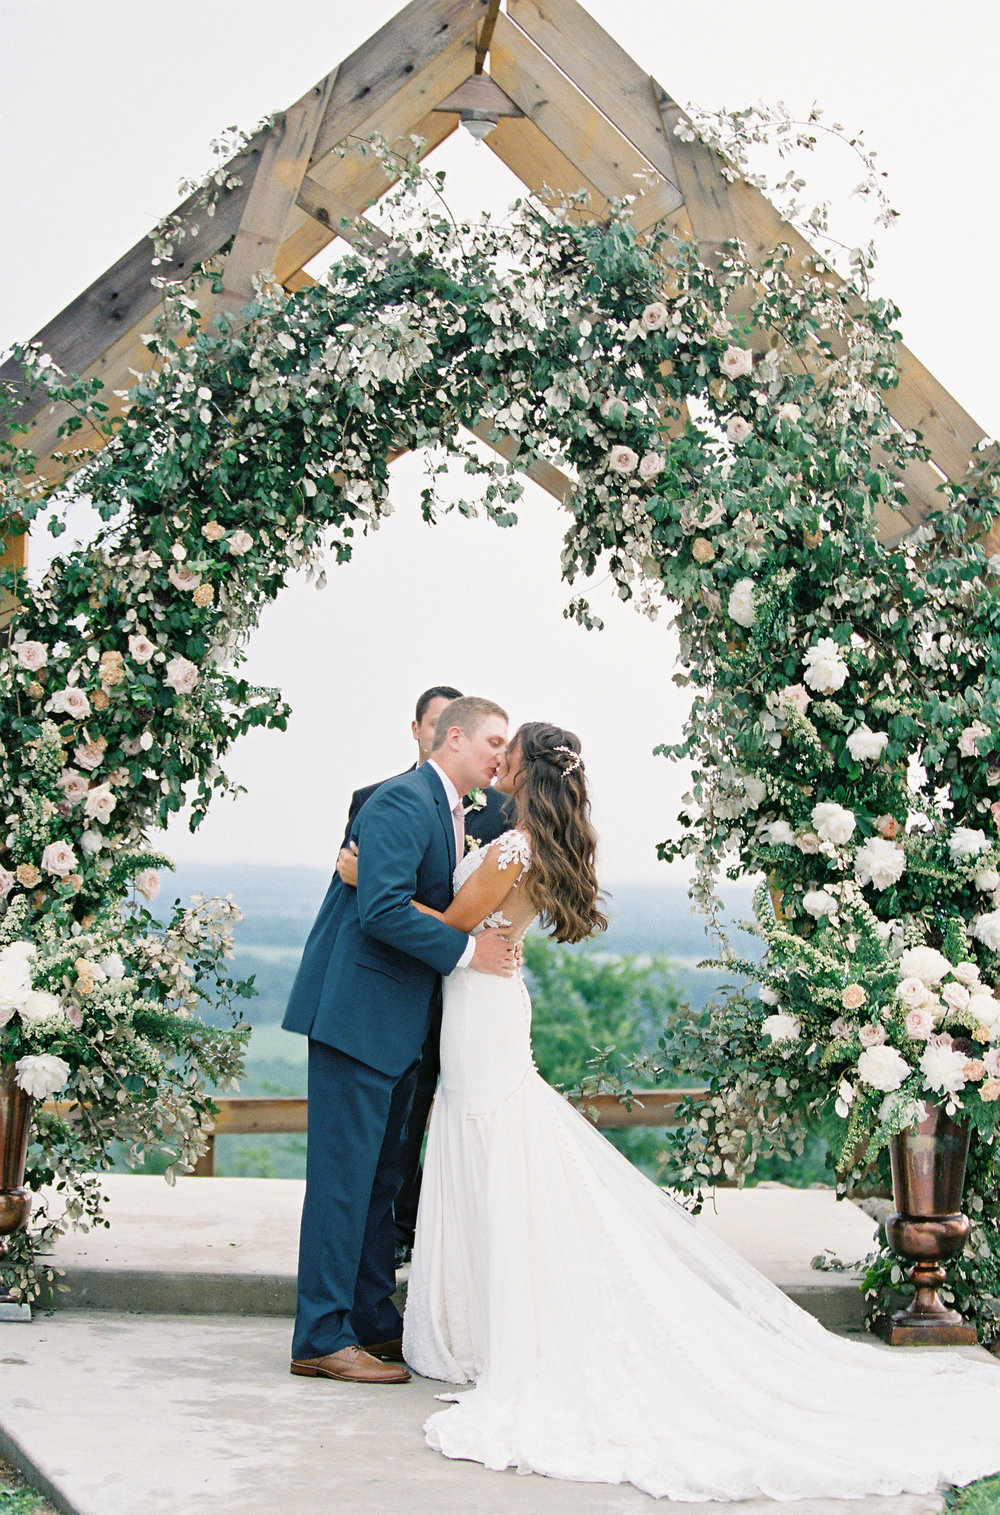 jessica-zimmerman-events-arkansas-mountain-wedding-couple-ceremony-flowers.jpg